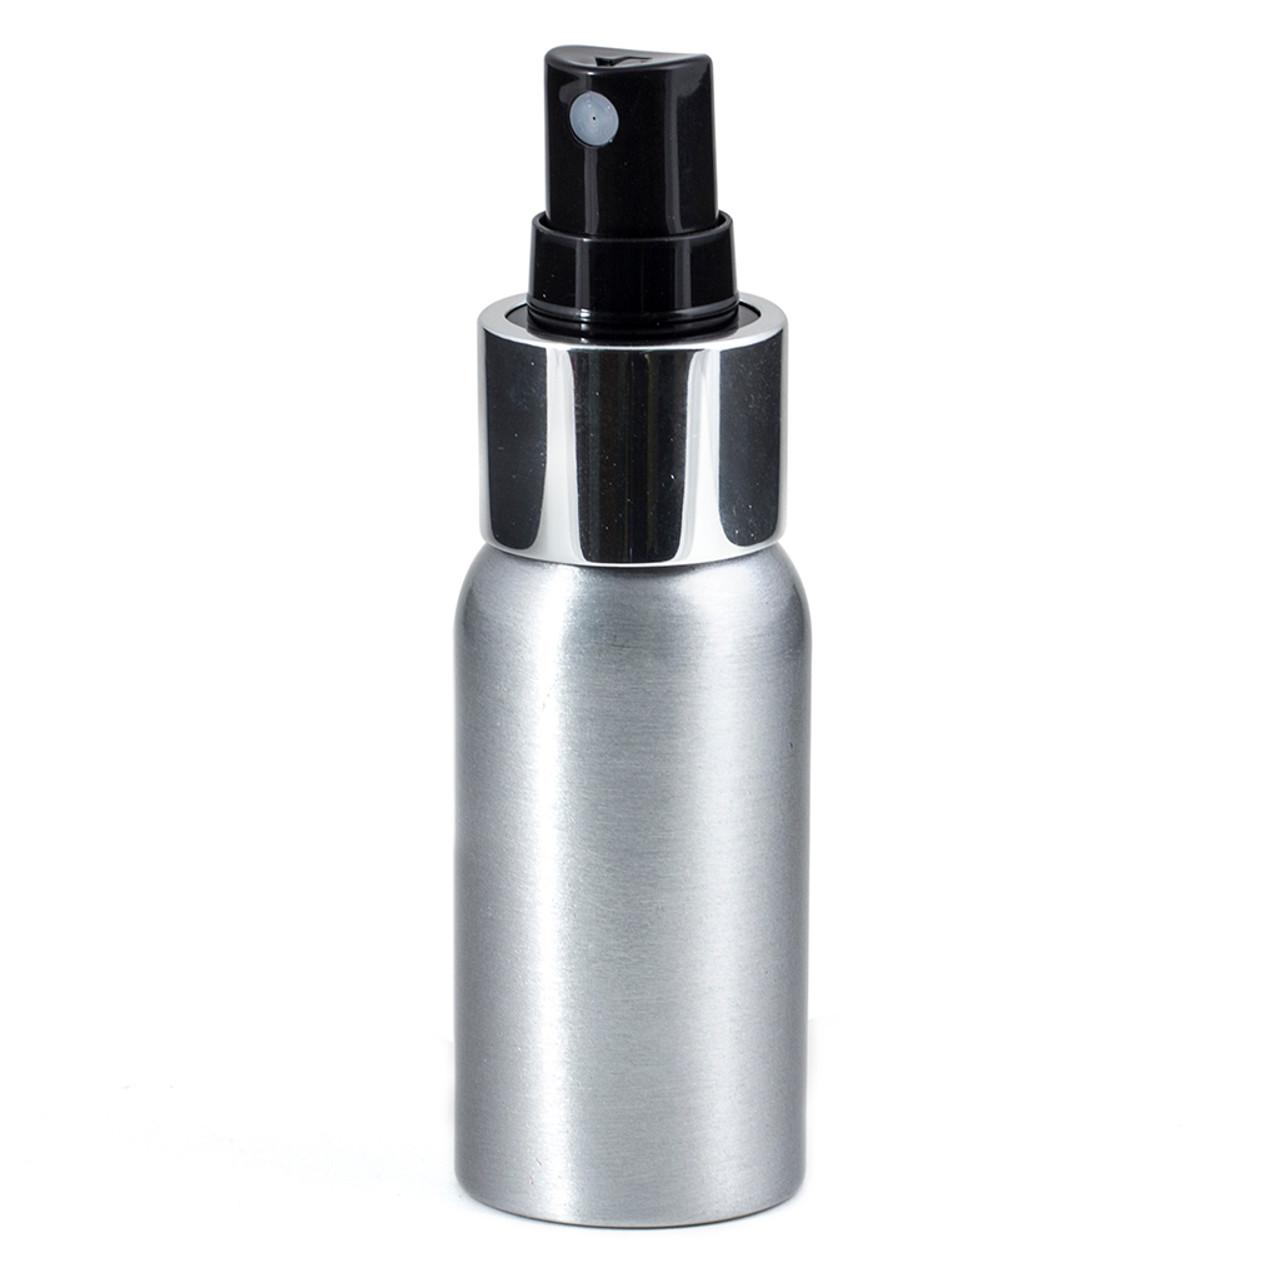 Pump Spray Bottle 30ml - Aluminium